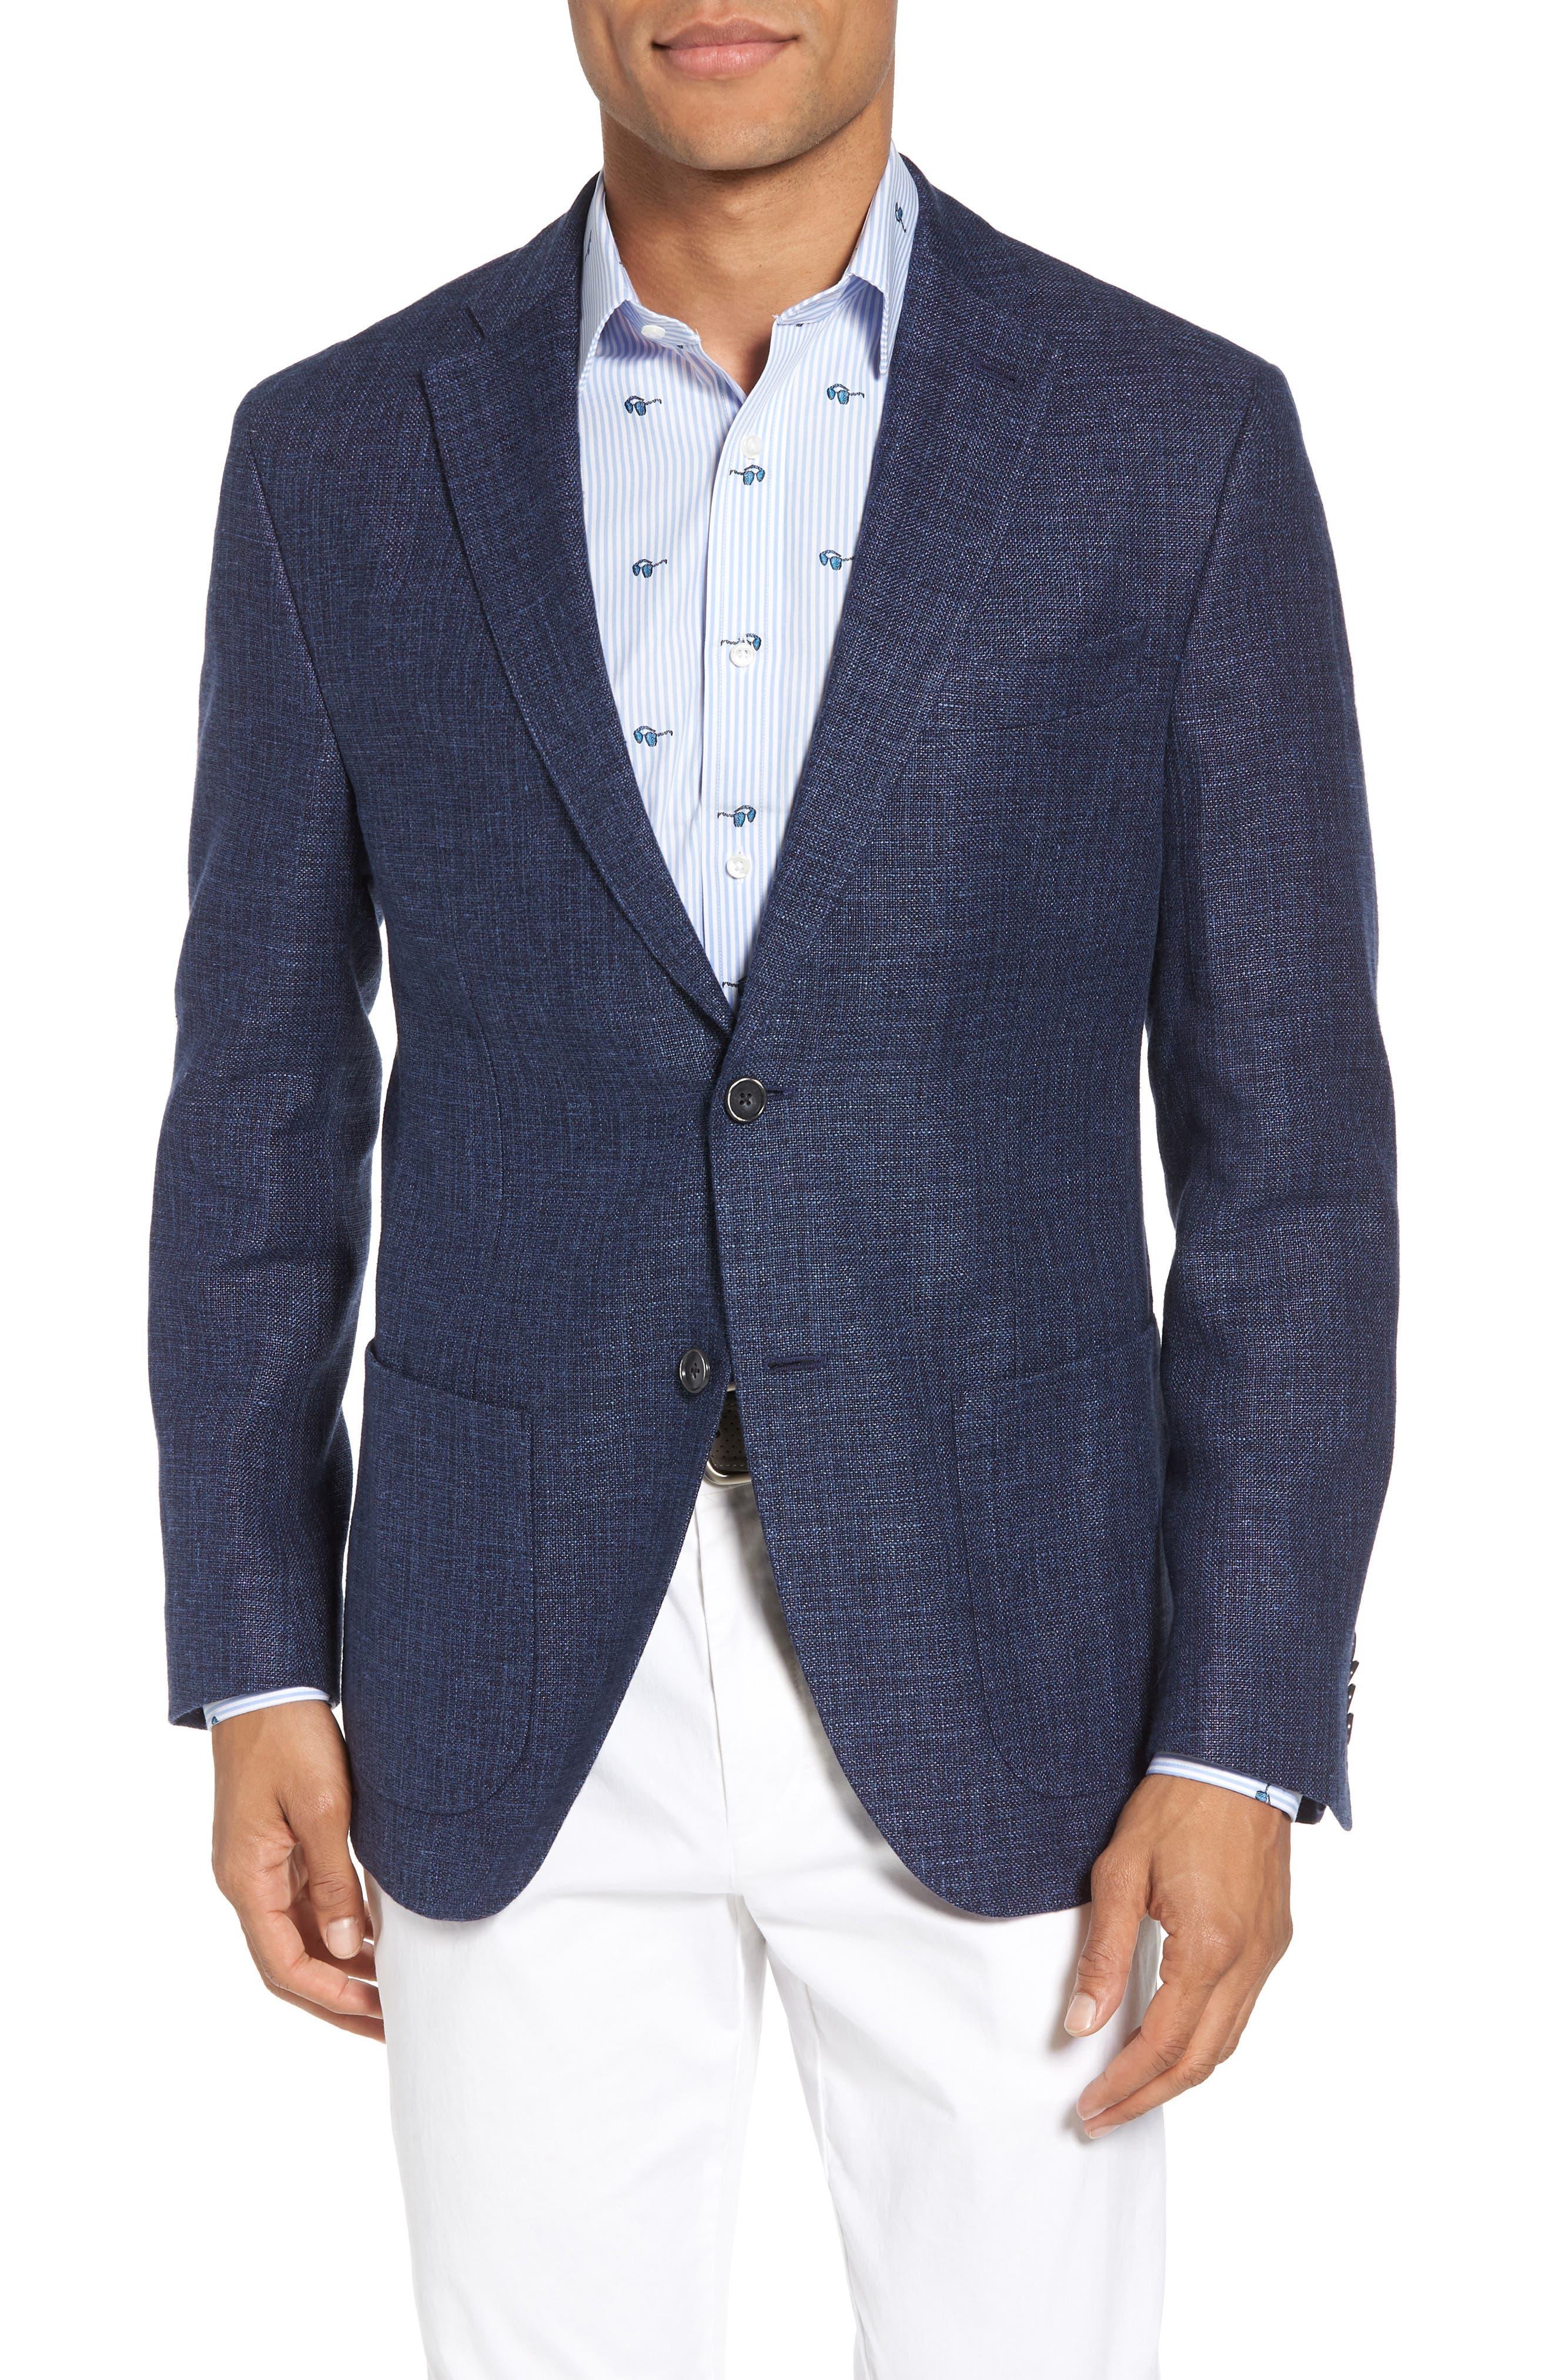 Trent Trim Fit Wool & Linen Blazer,                         Main,                         color, Navy